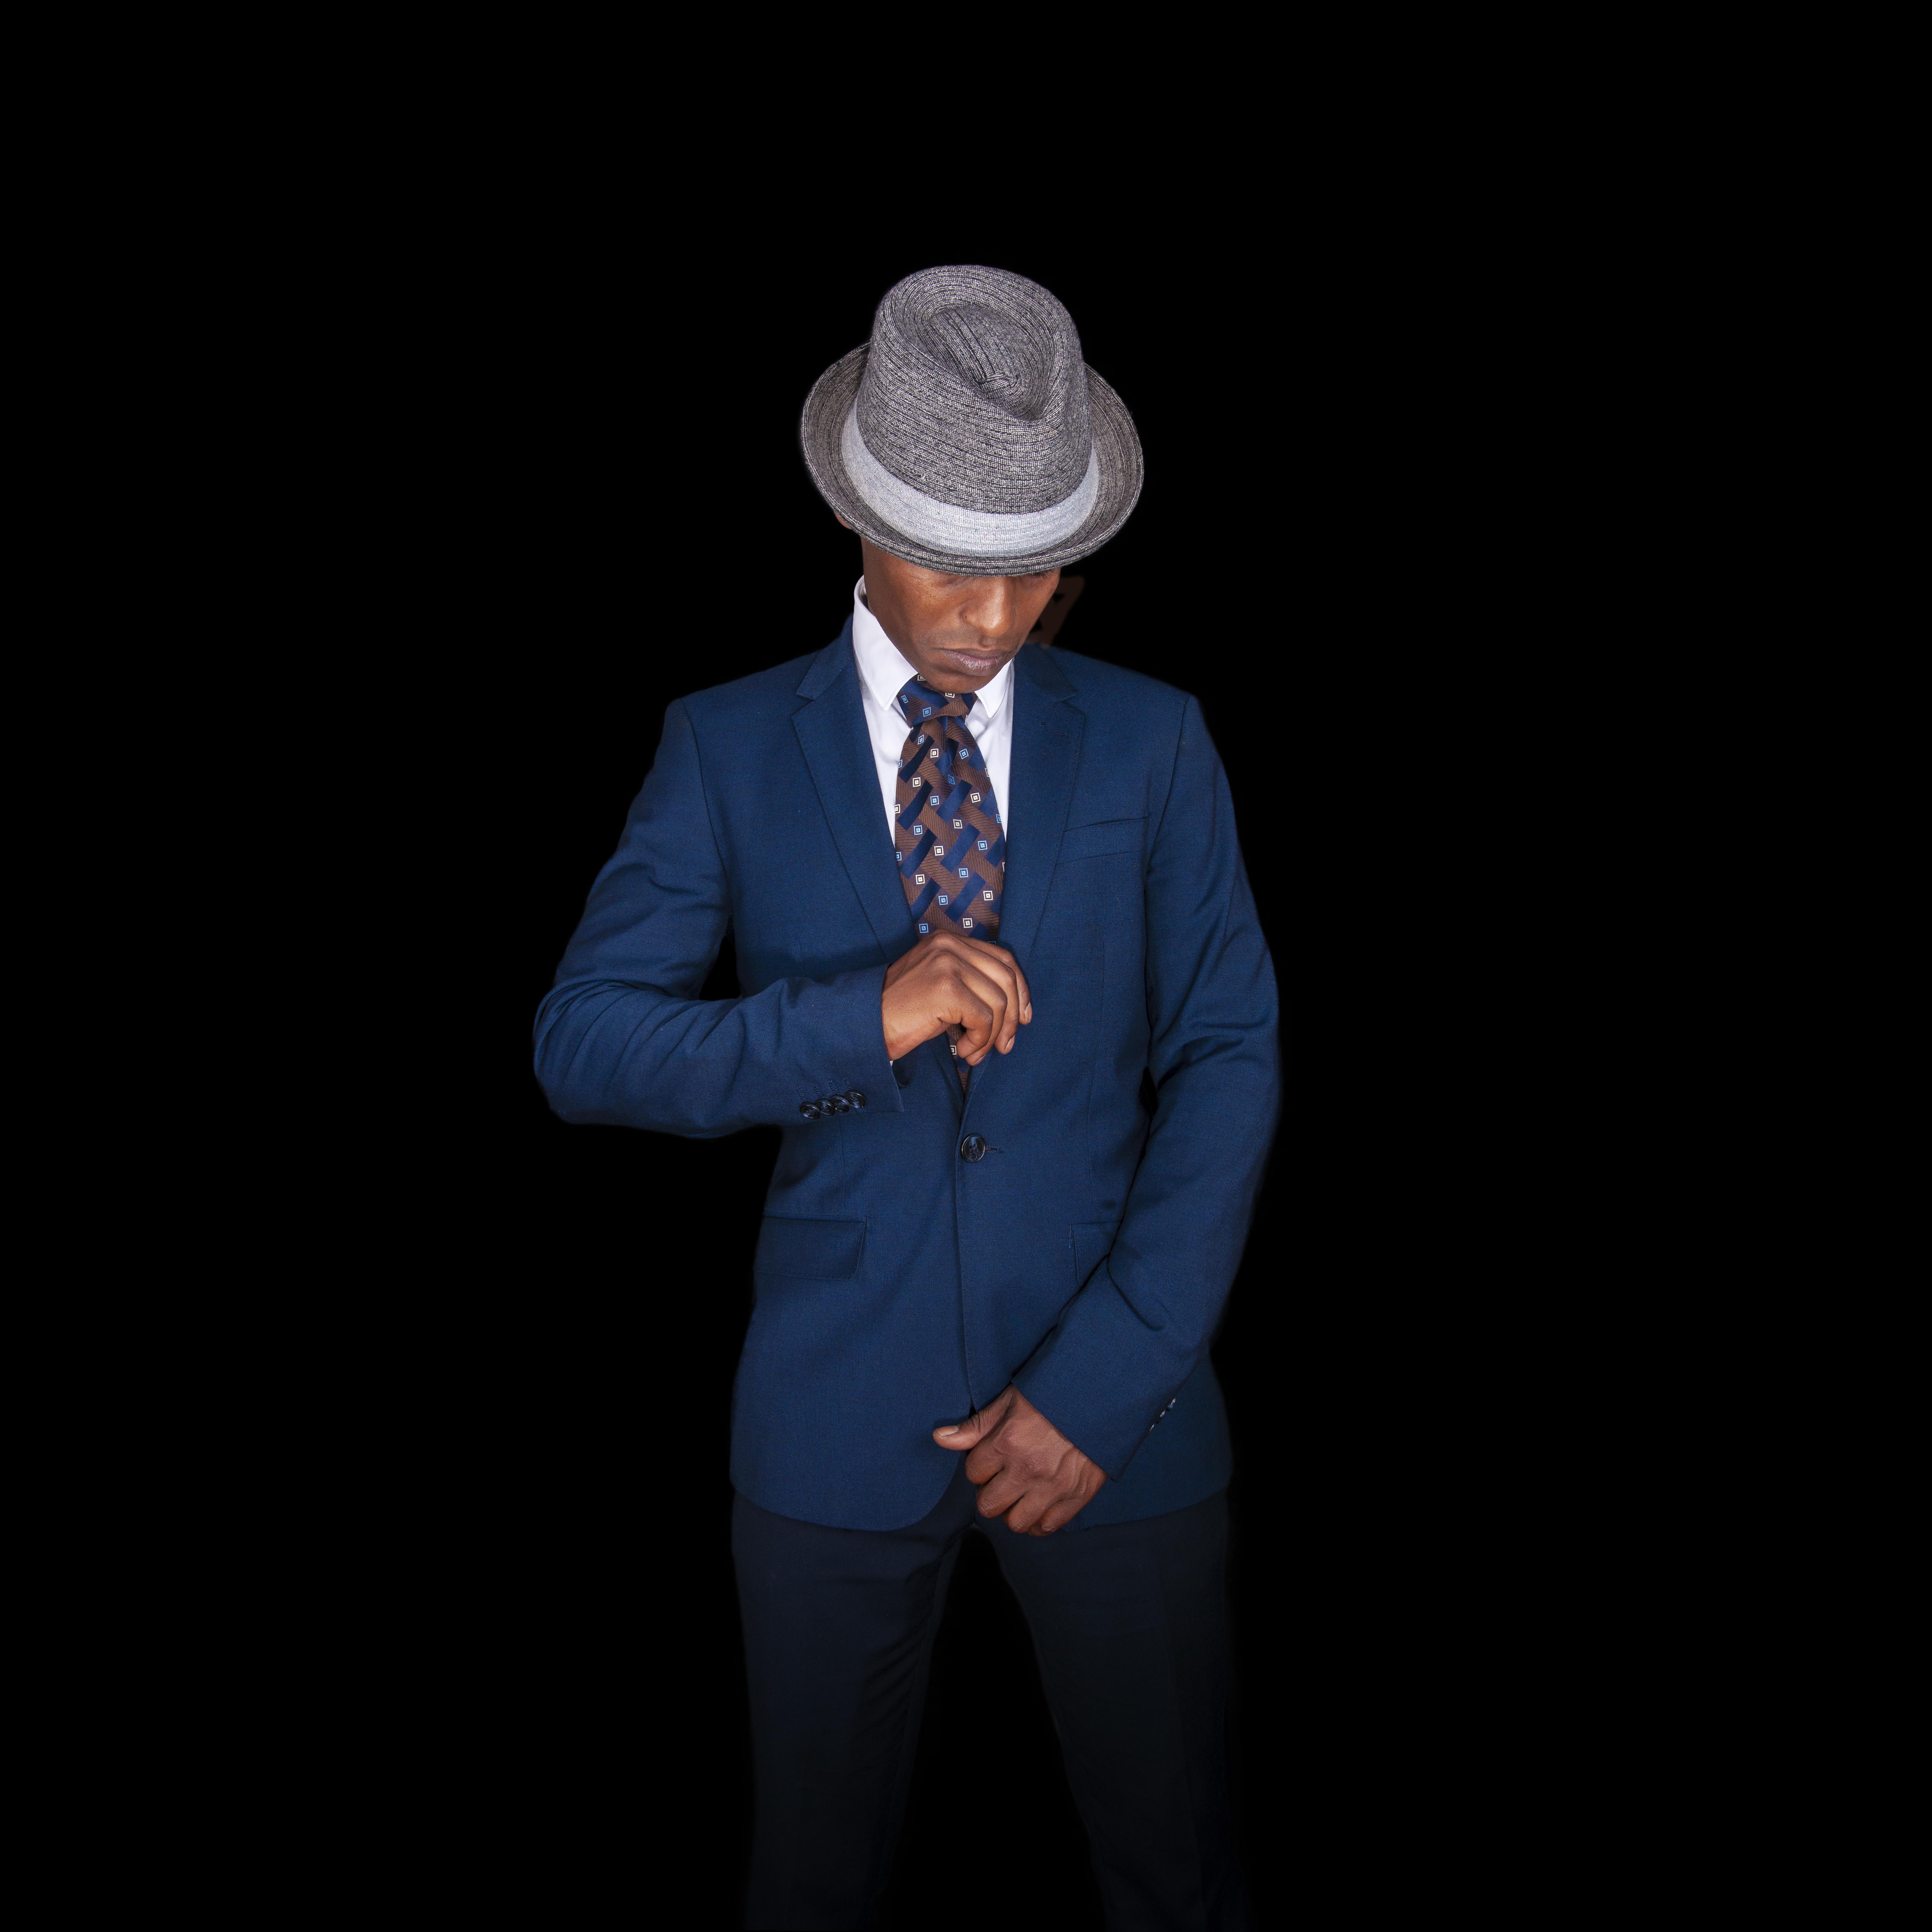 Blue suited man